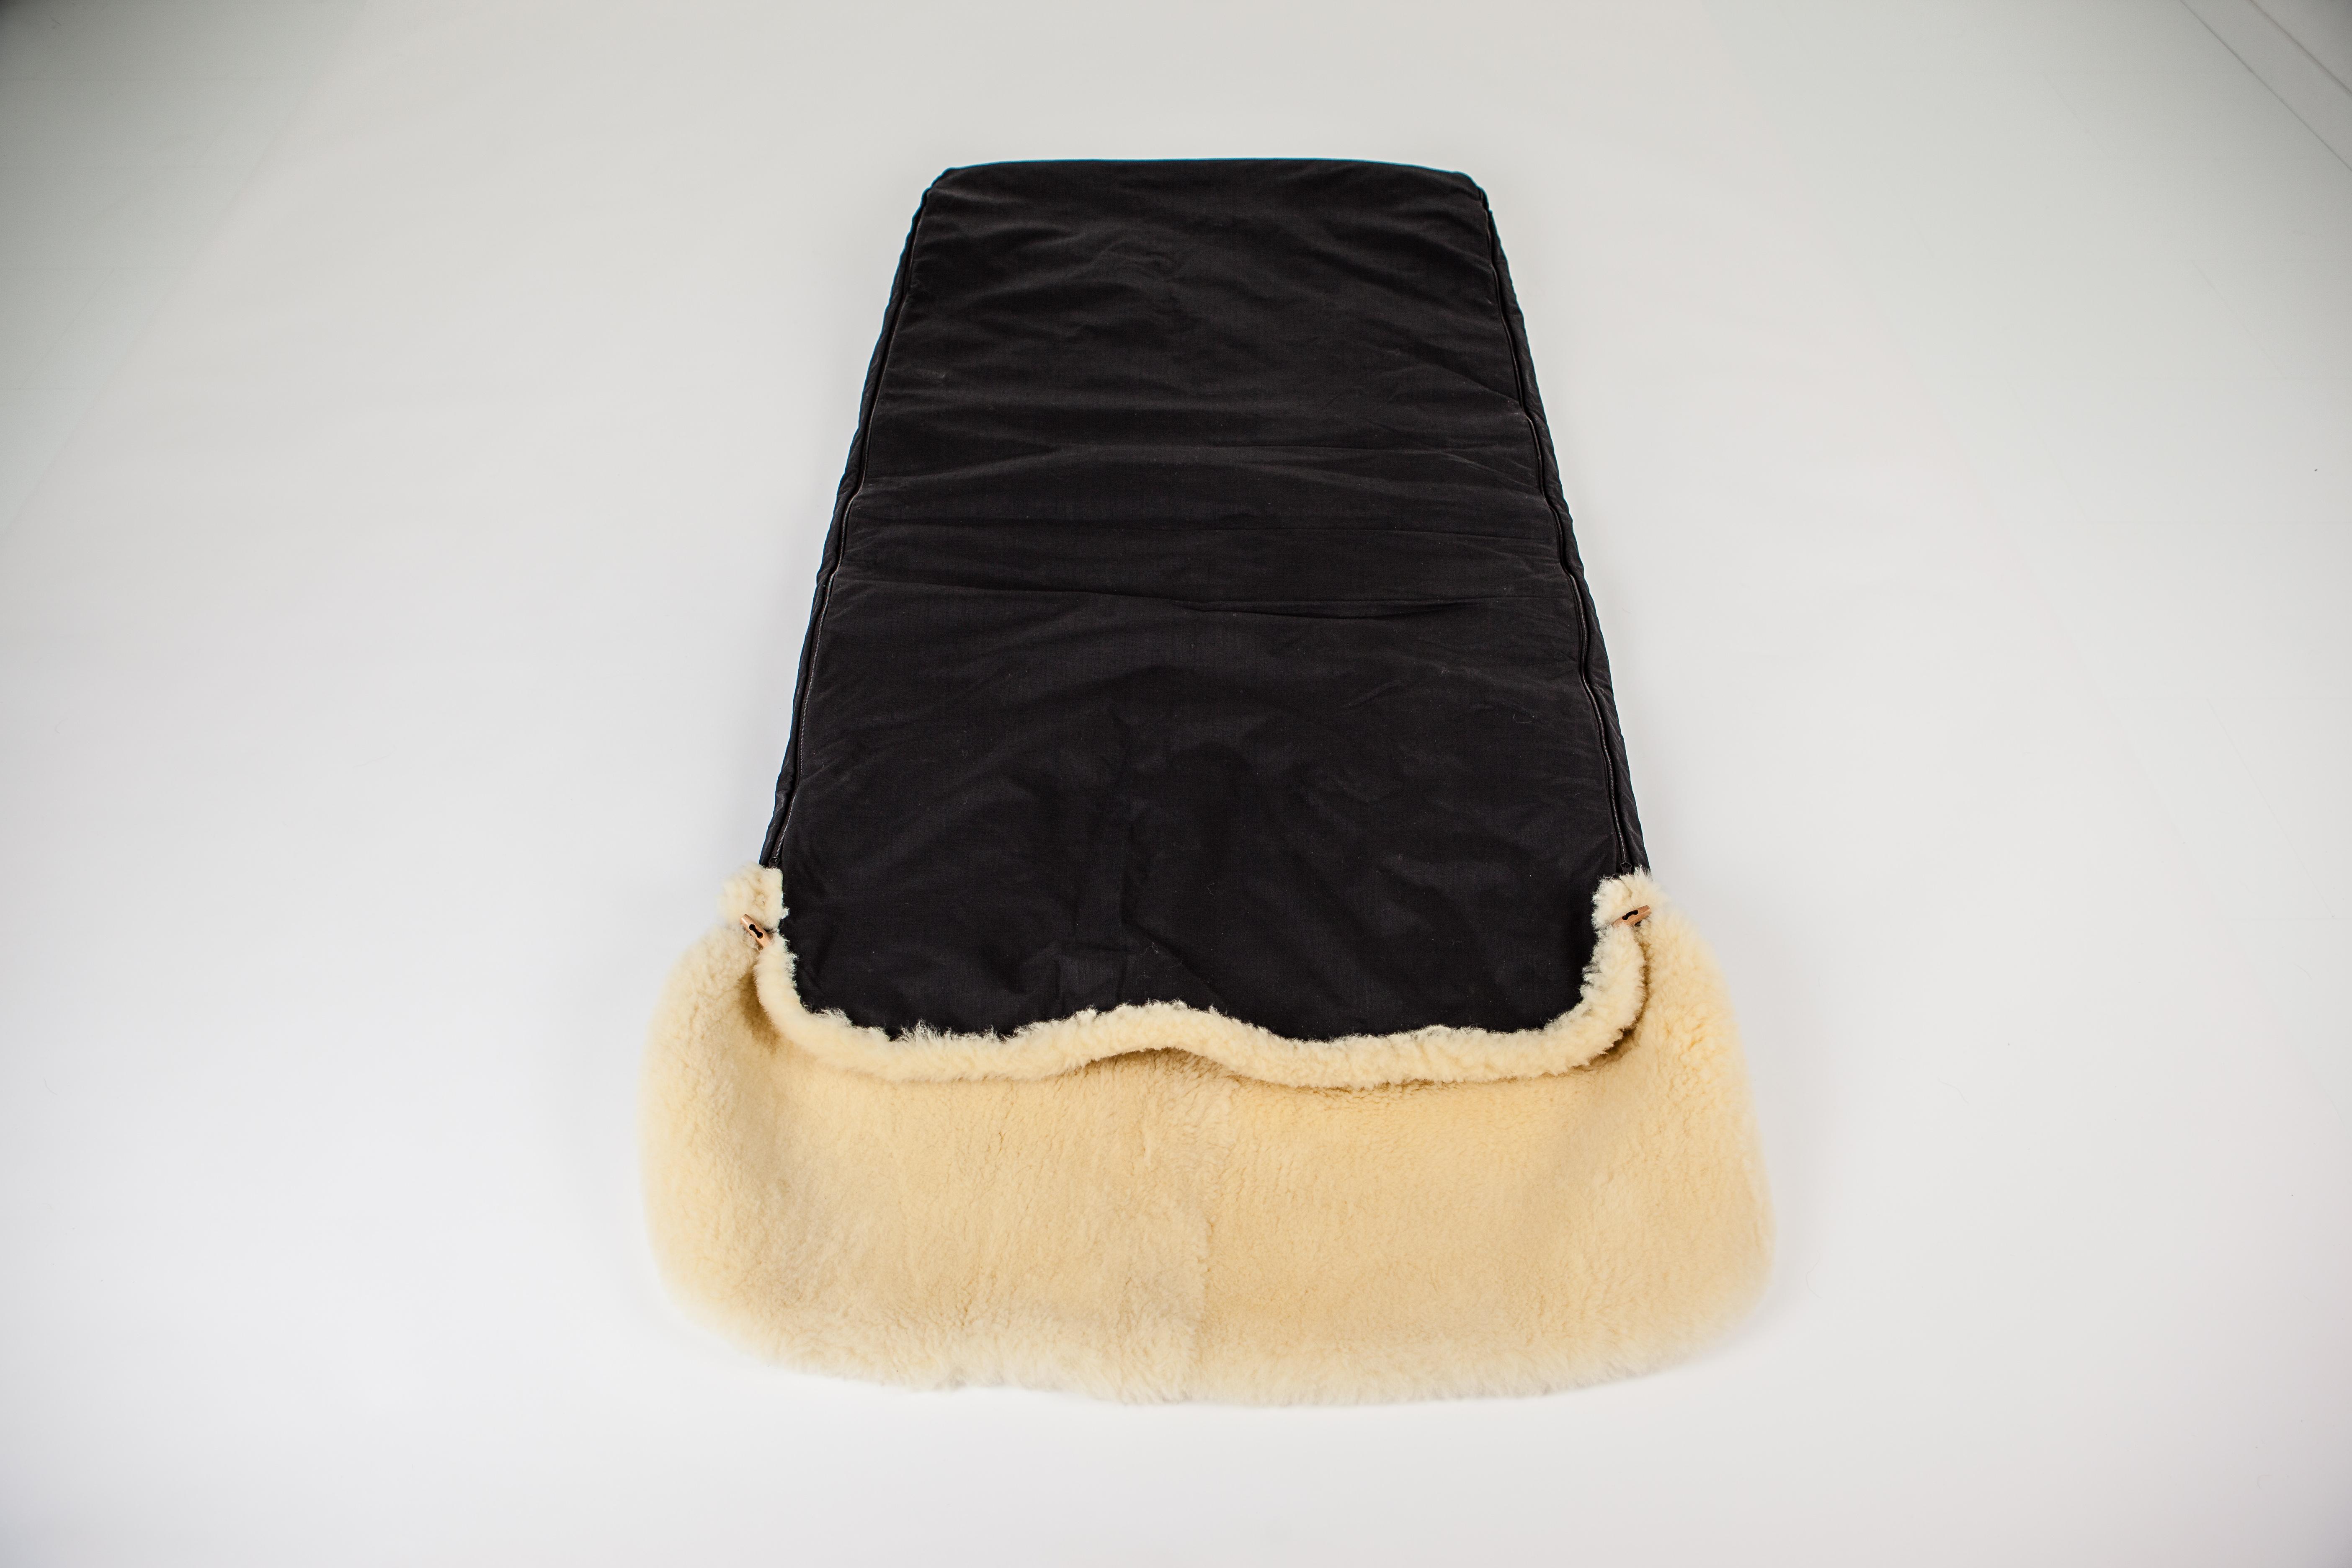 lolfinger lammfell schlafsack f r erwachsene schwarz lolfinger. Black Bedroom Furniture Sets. Home Design Ideas